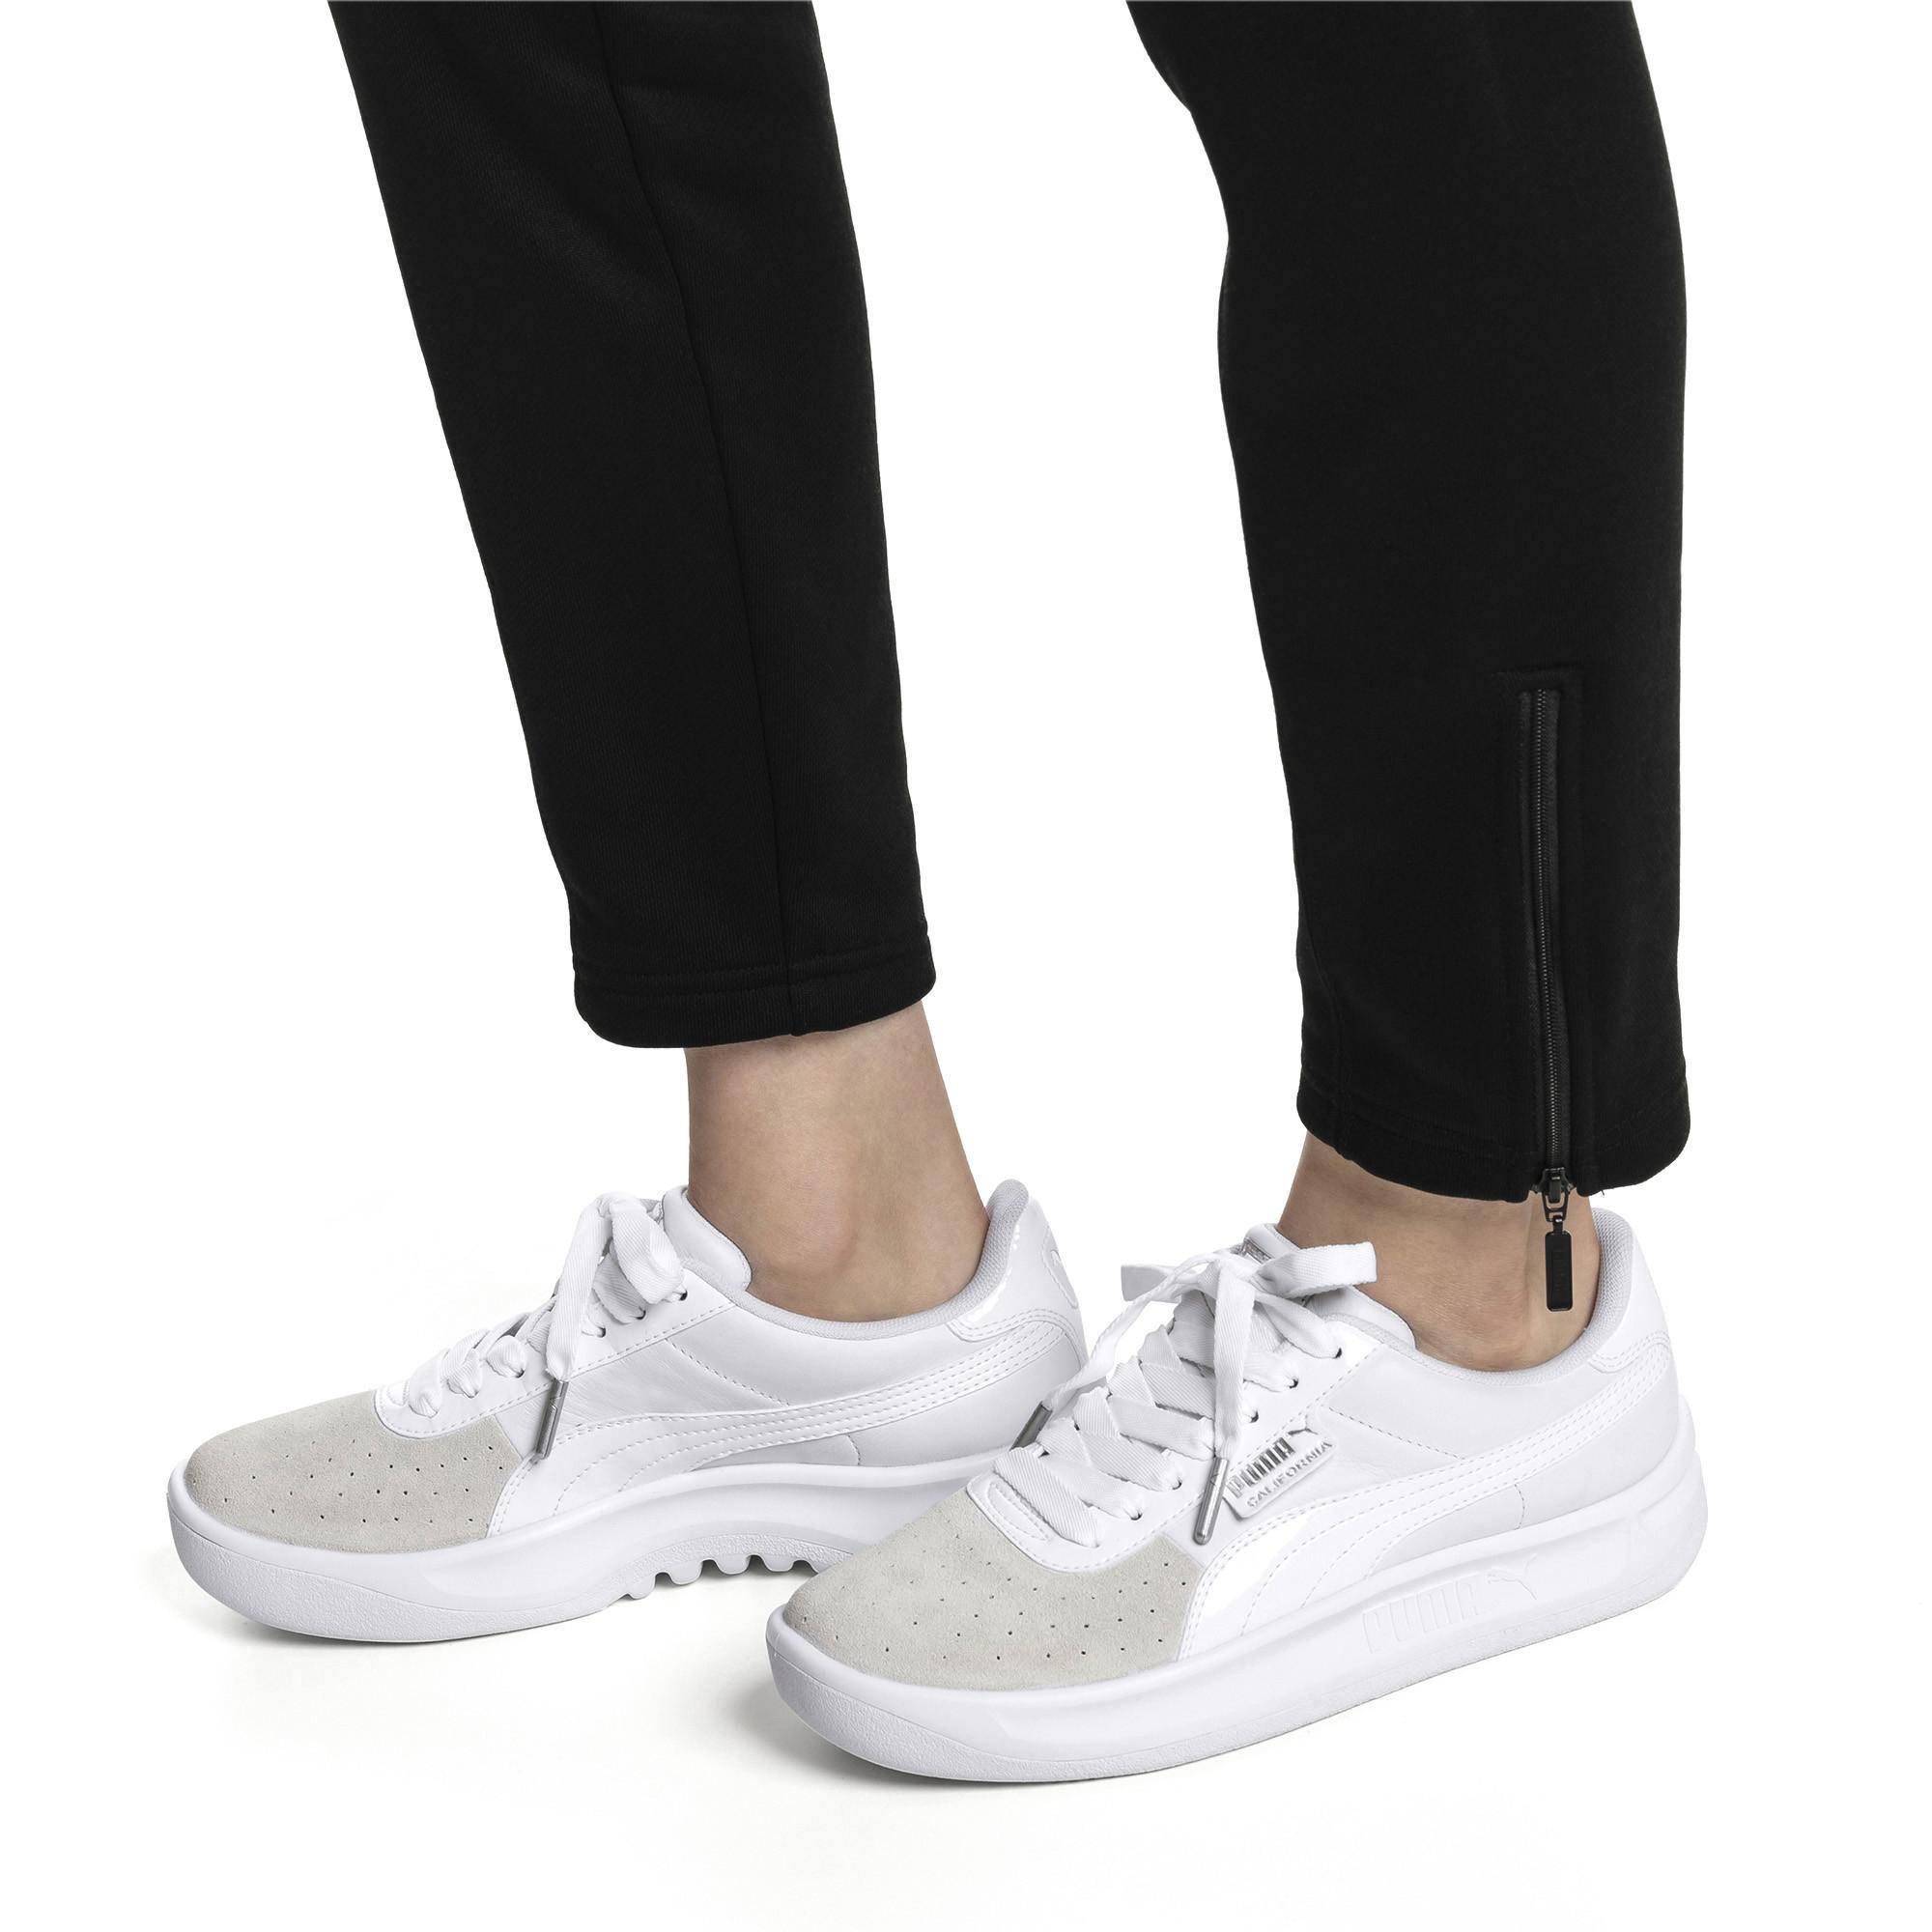 California Monochrome Women's Sneakers